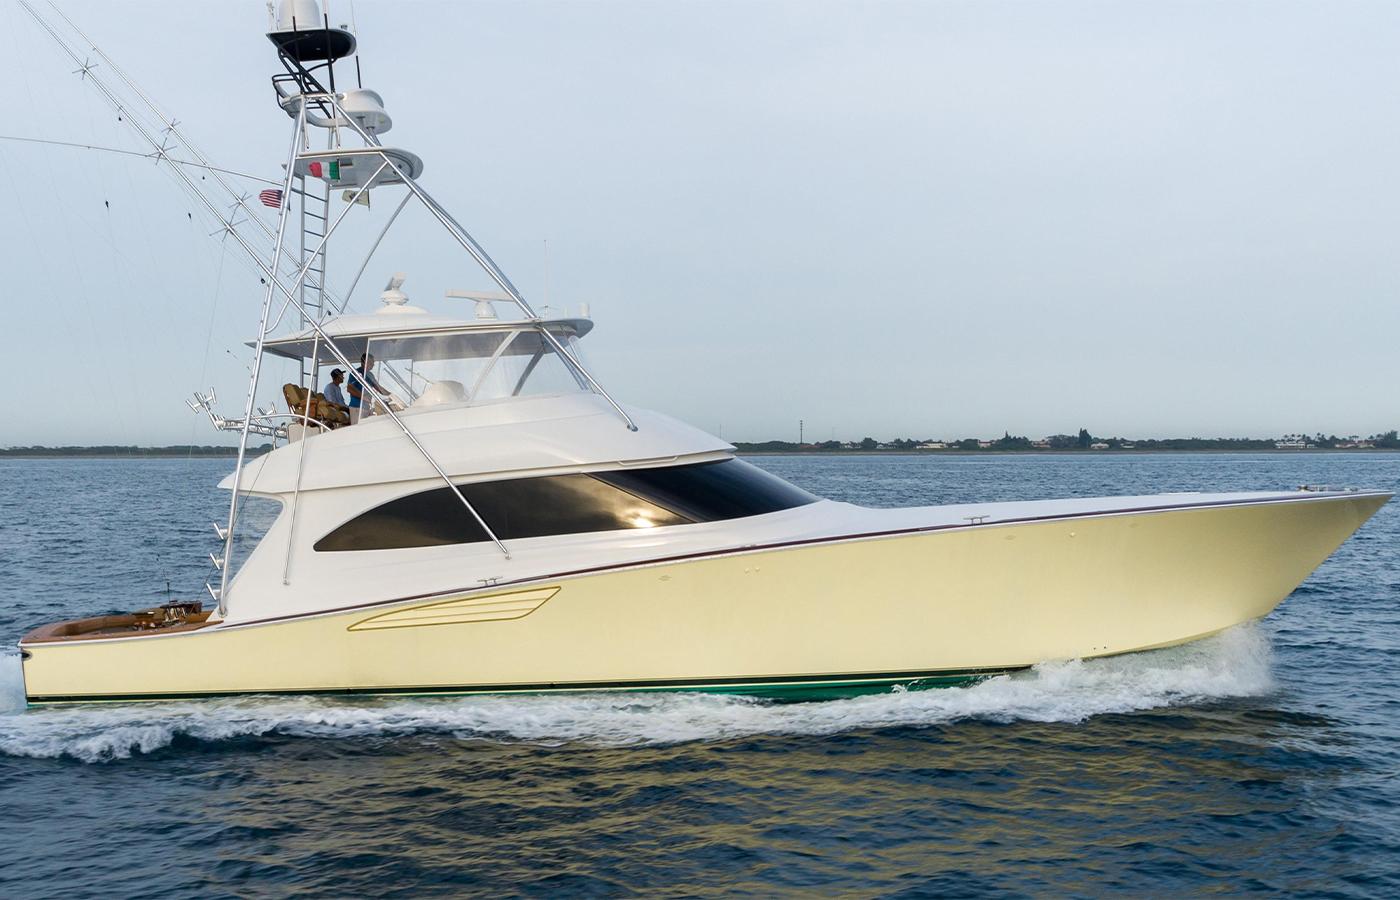 Viking 70 Sportfish Yacht Highlight [Boat Review + Video]